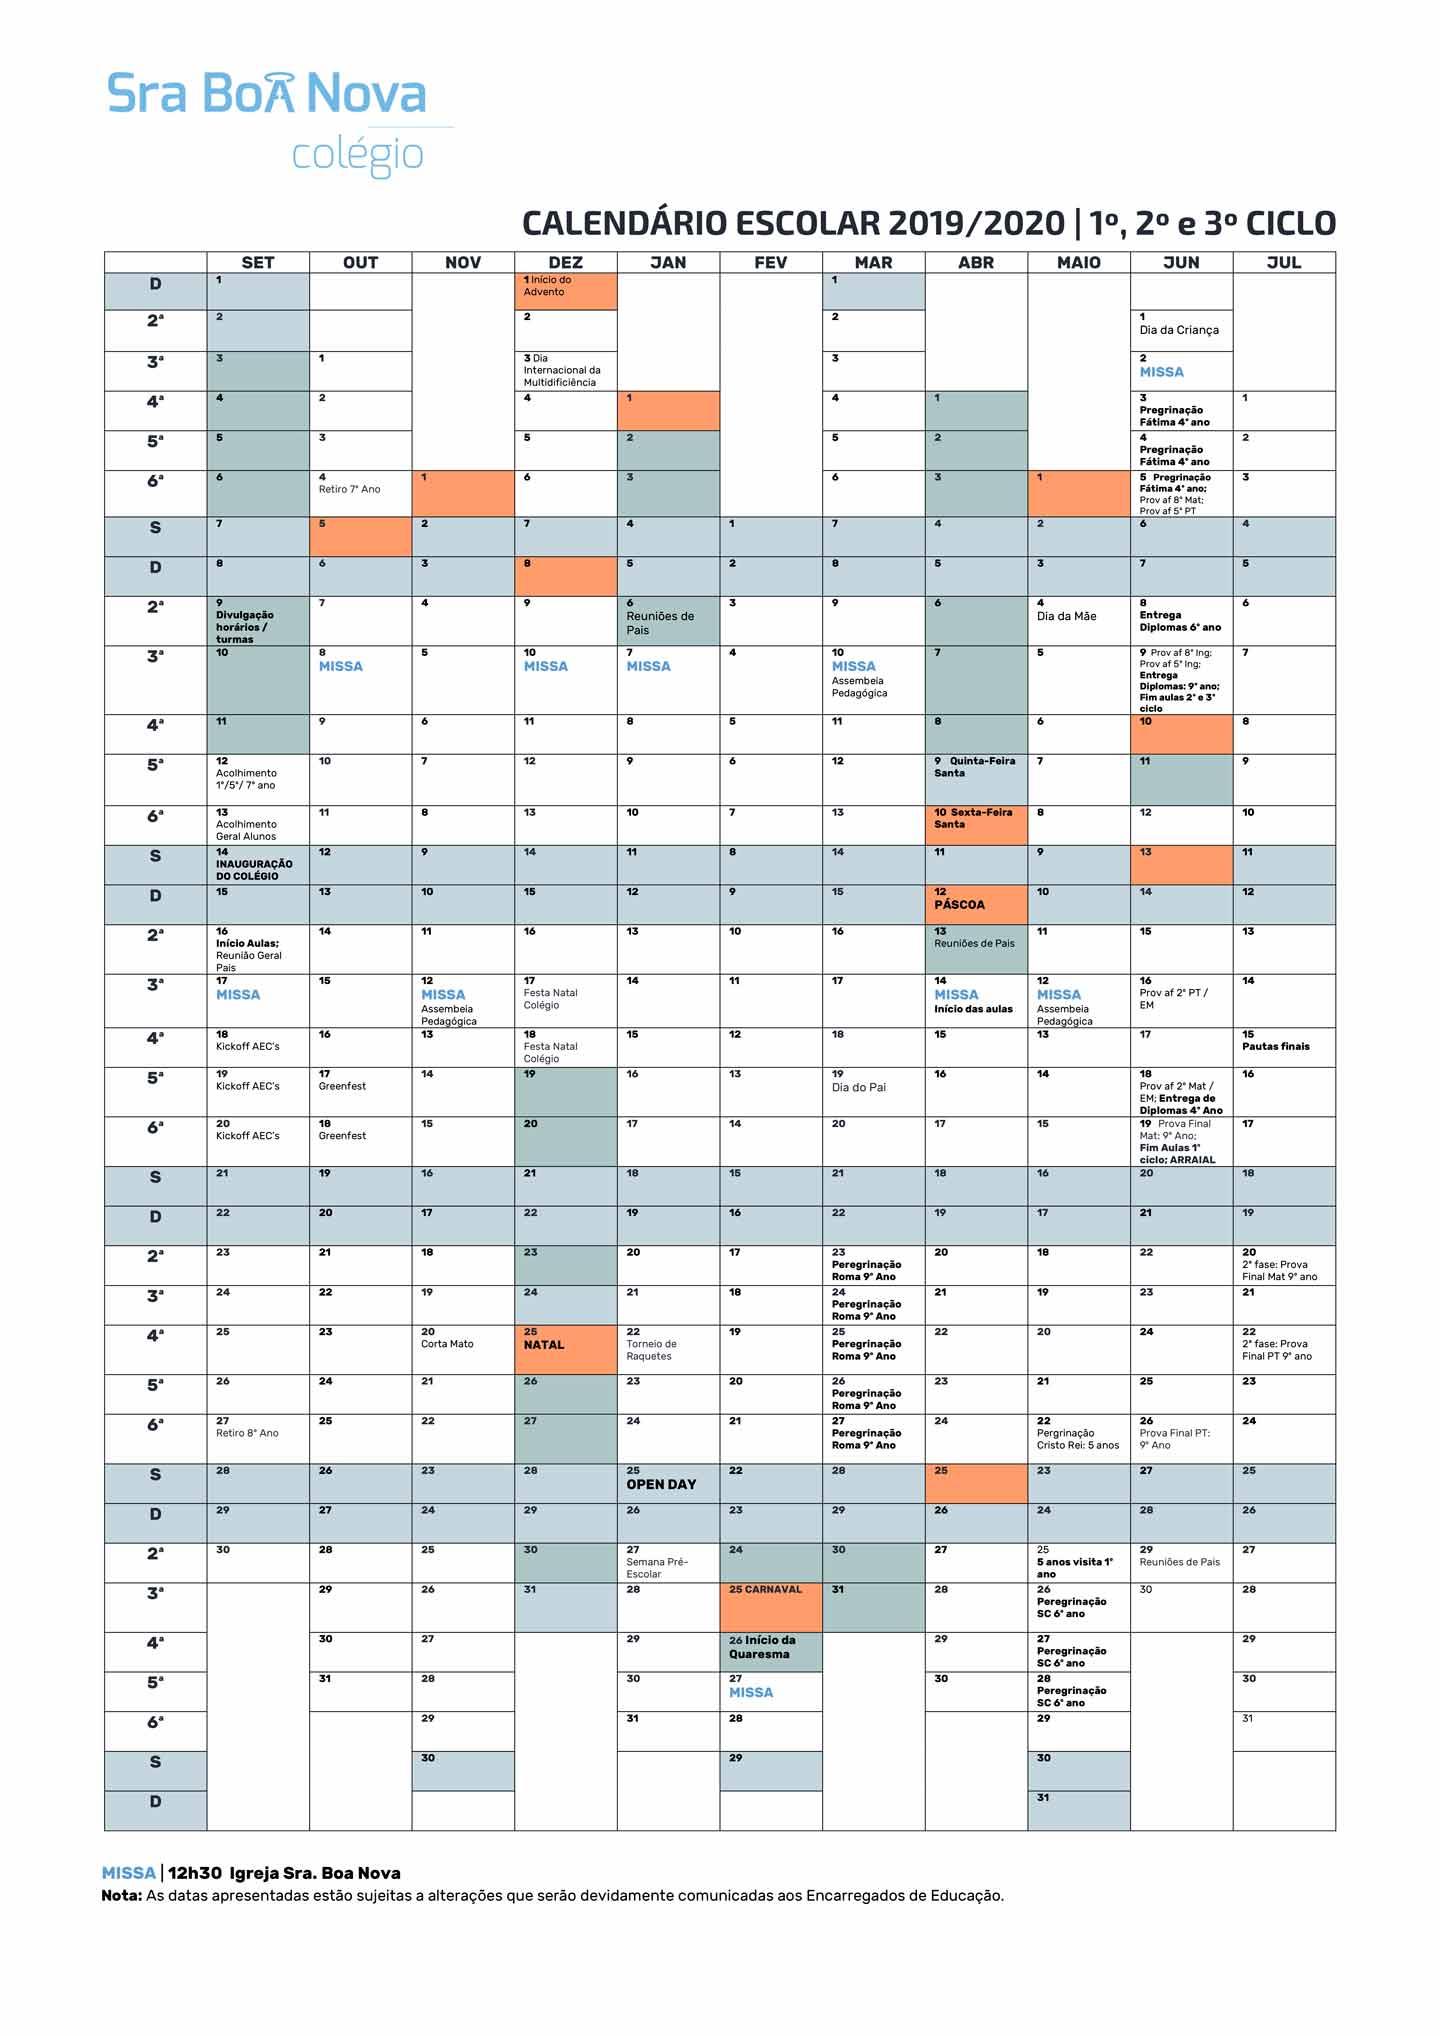 calendario-1ate3ciclo